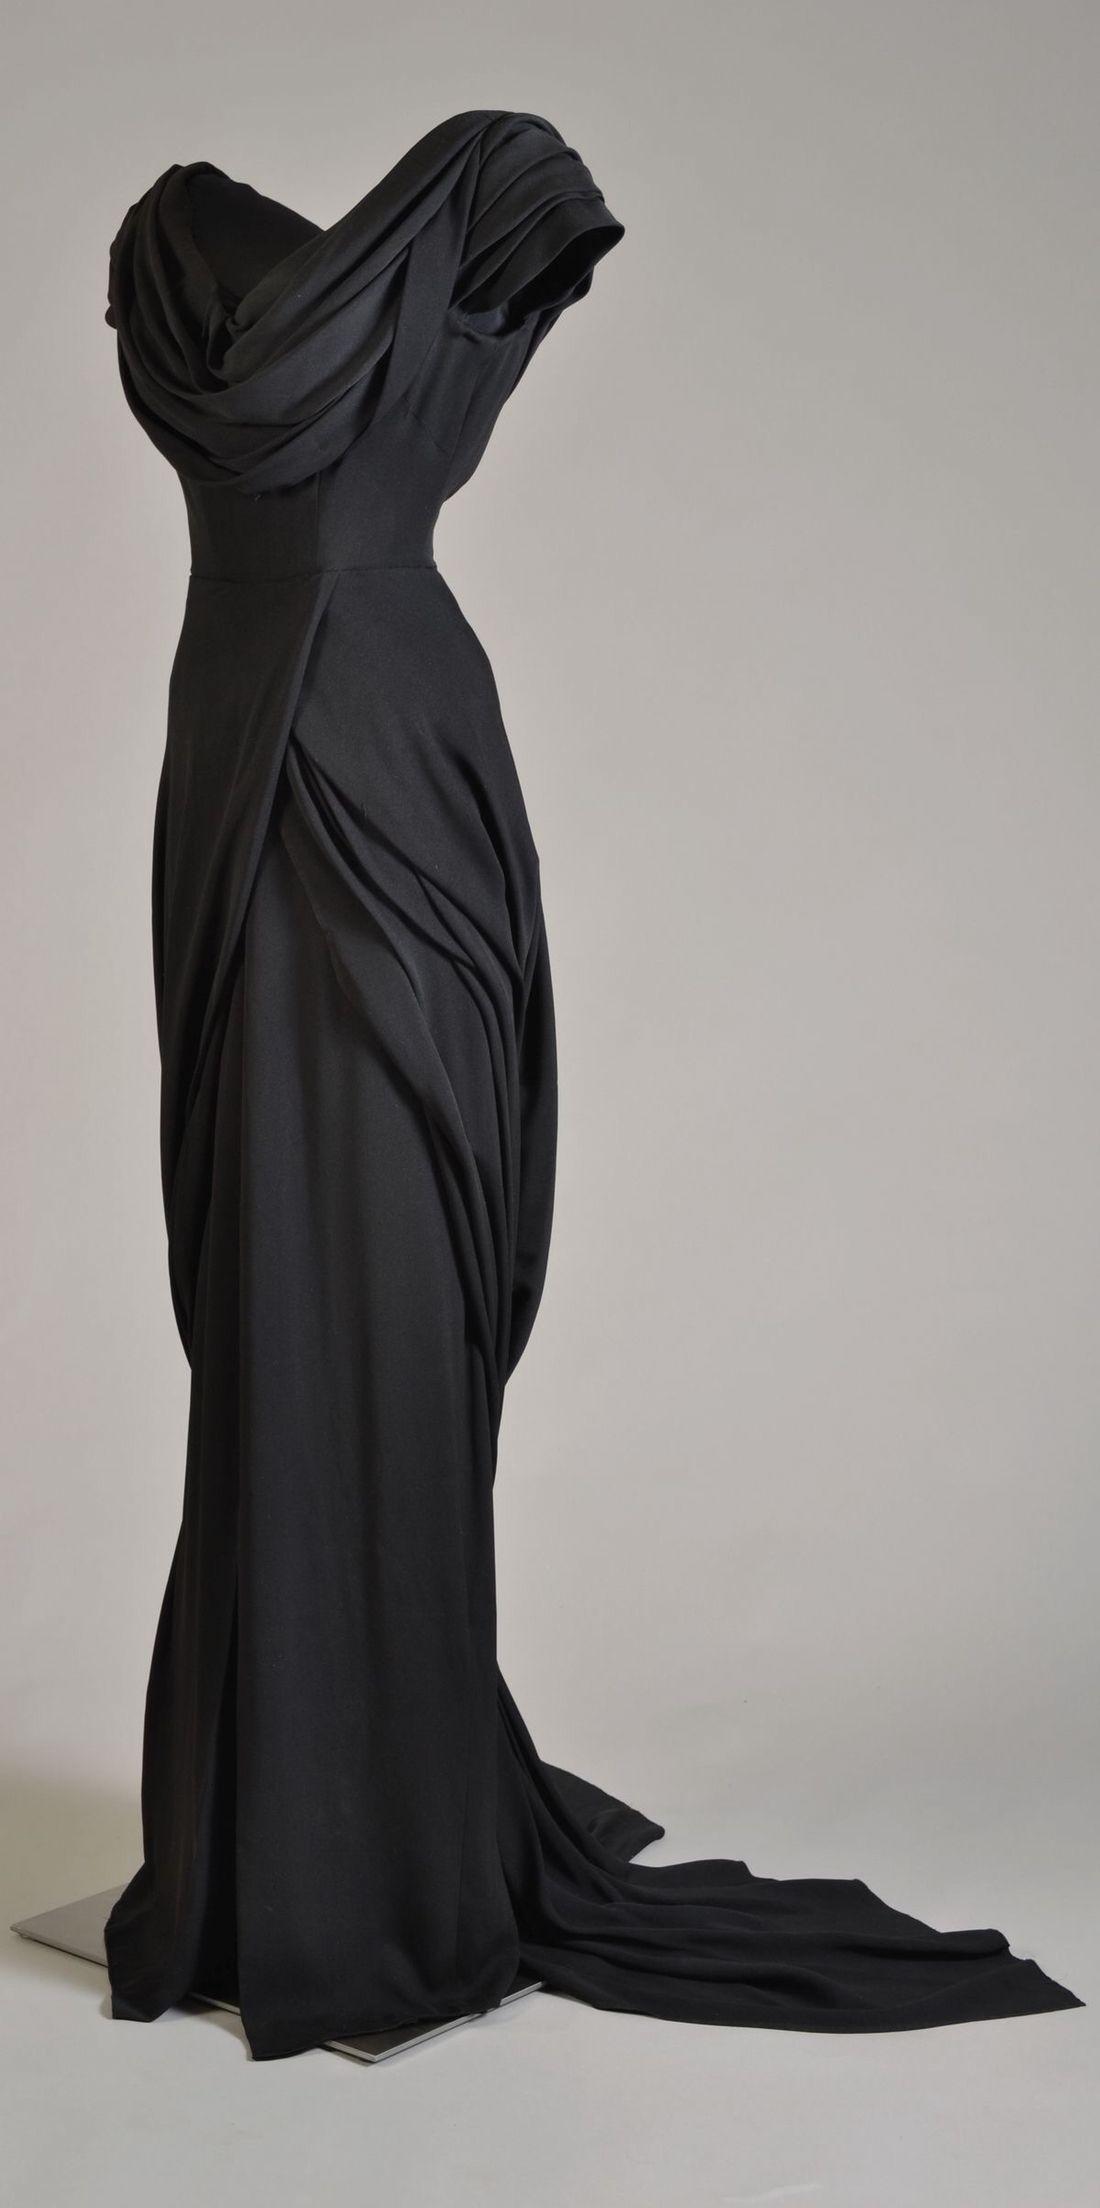 Adams rib designed by walter plunkett for katharine hepburn